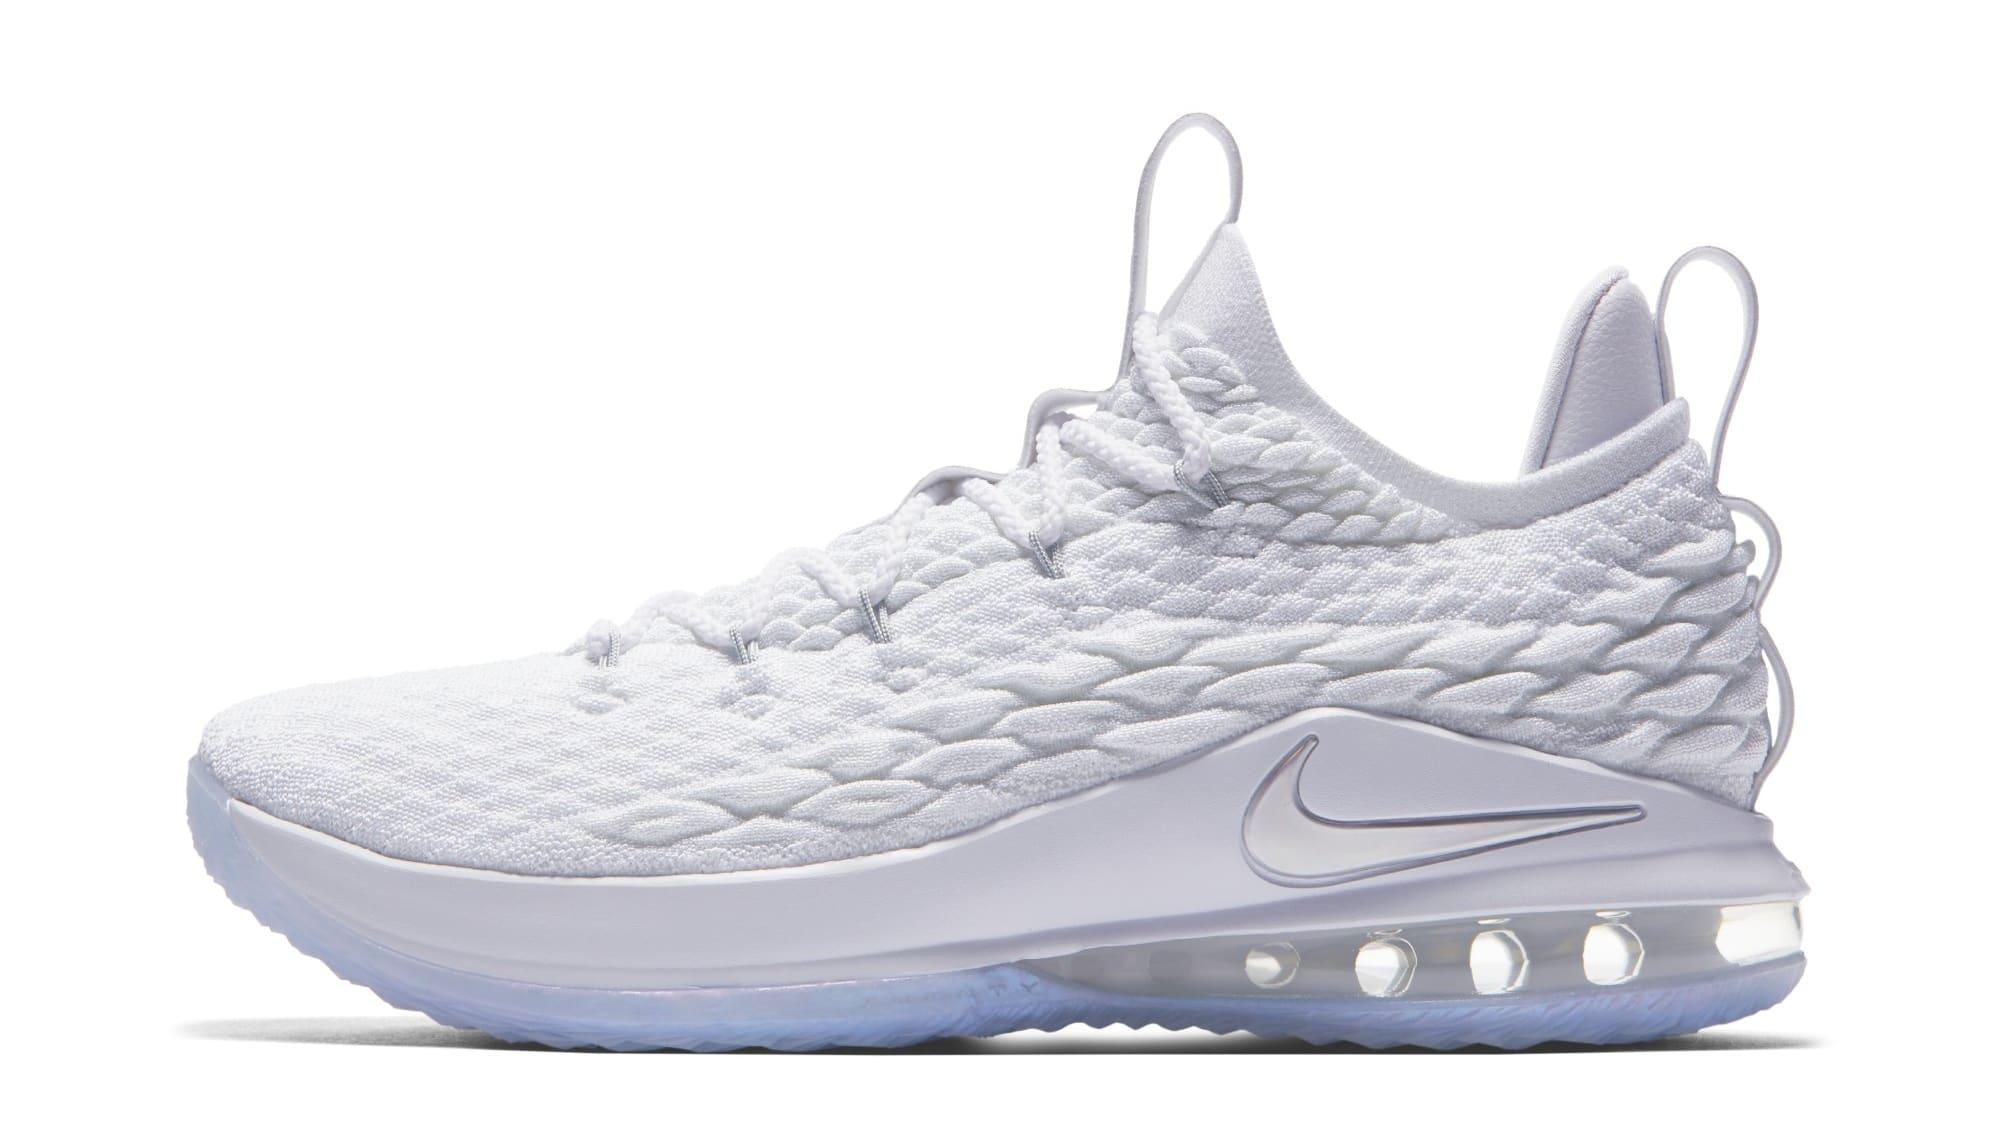 Nike LeBron 15 Low 'White' AO1755-100 (Lateral)